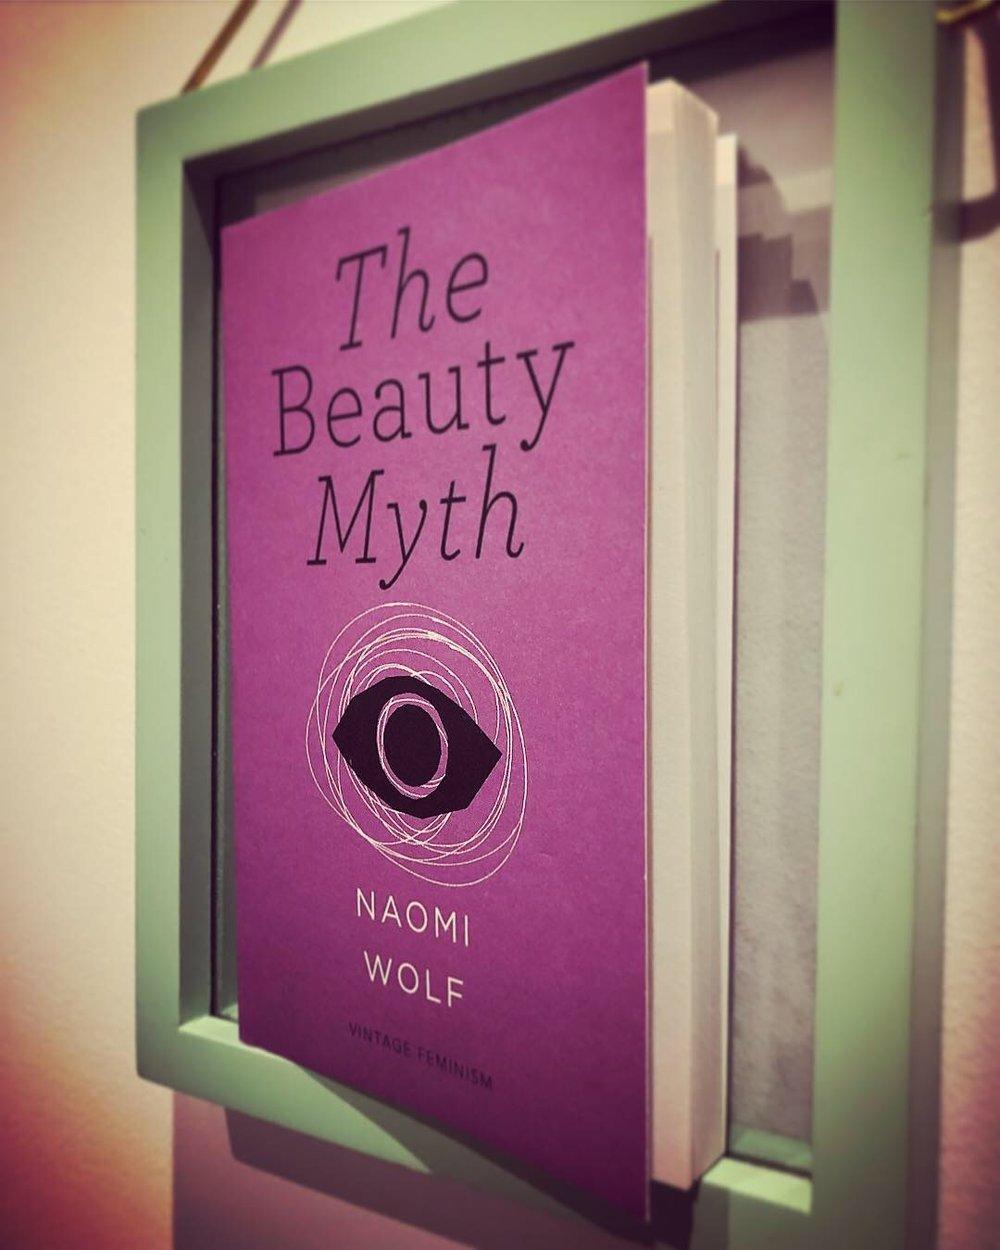 THE BEAUTY MYTH: NAOMI WOLF